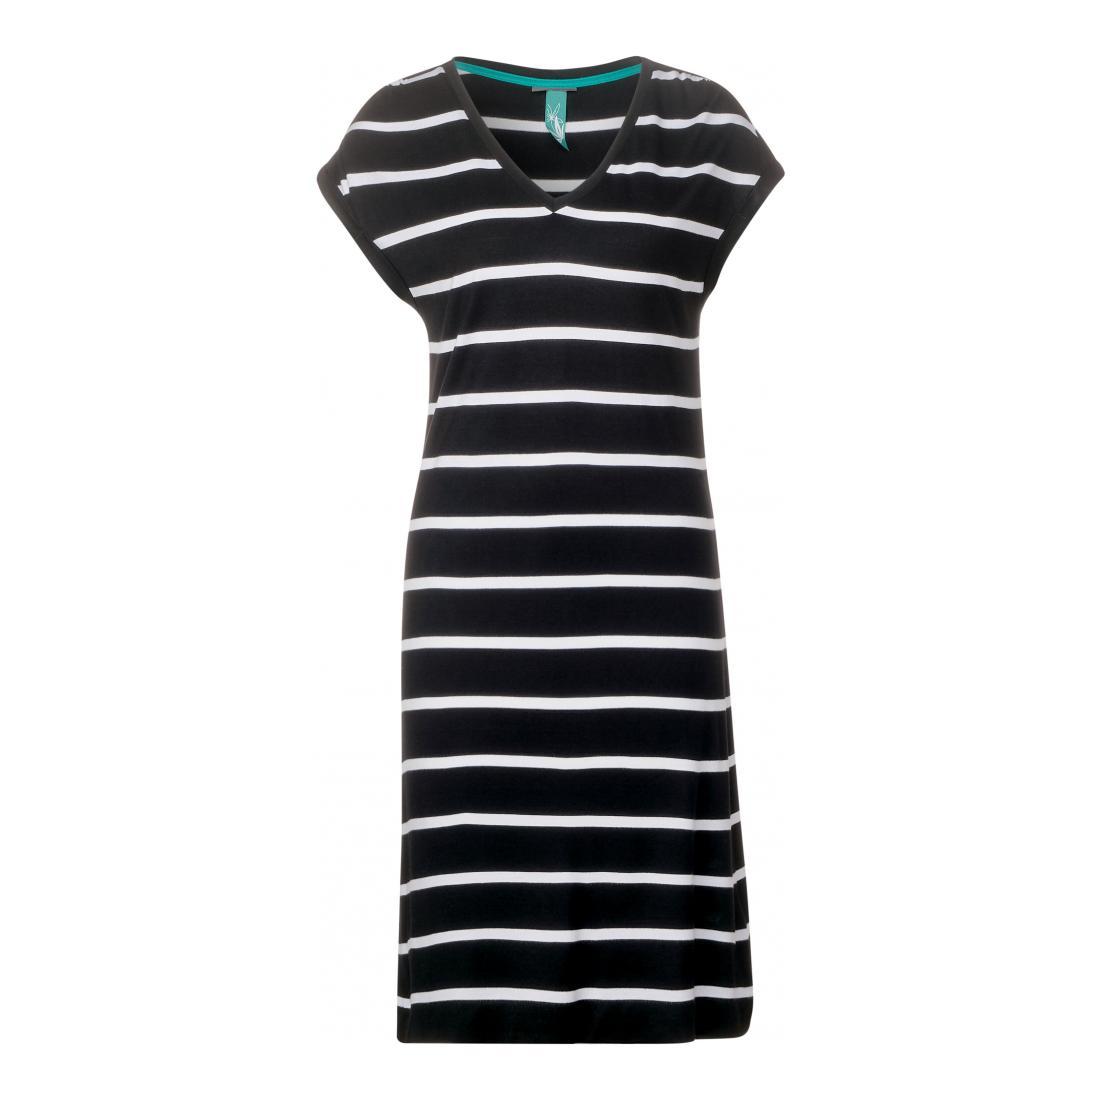 Street One Kleider kurz Damen LTD QR T-shirt Dress L96